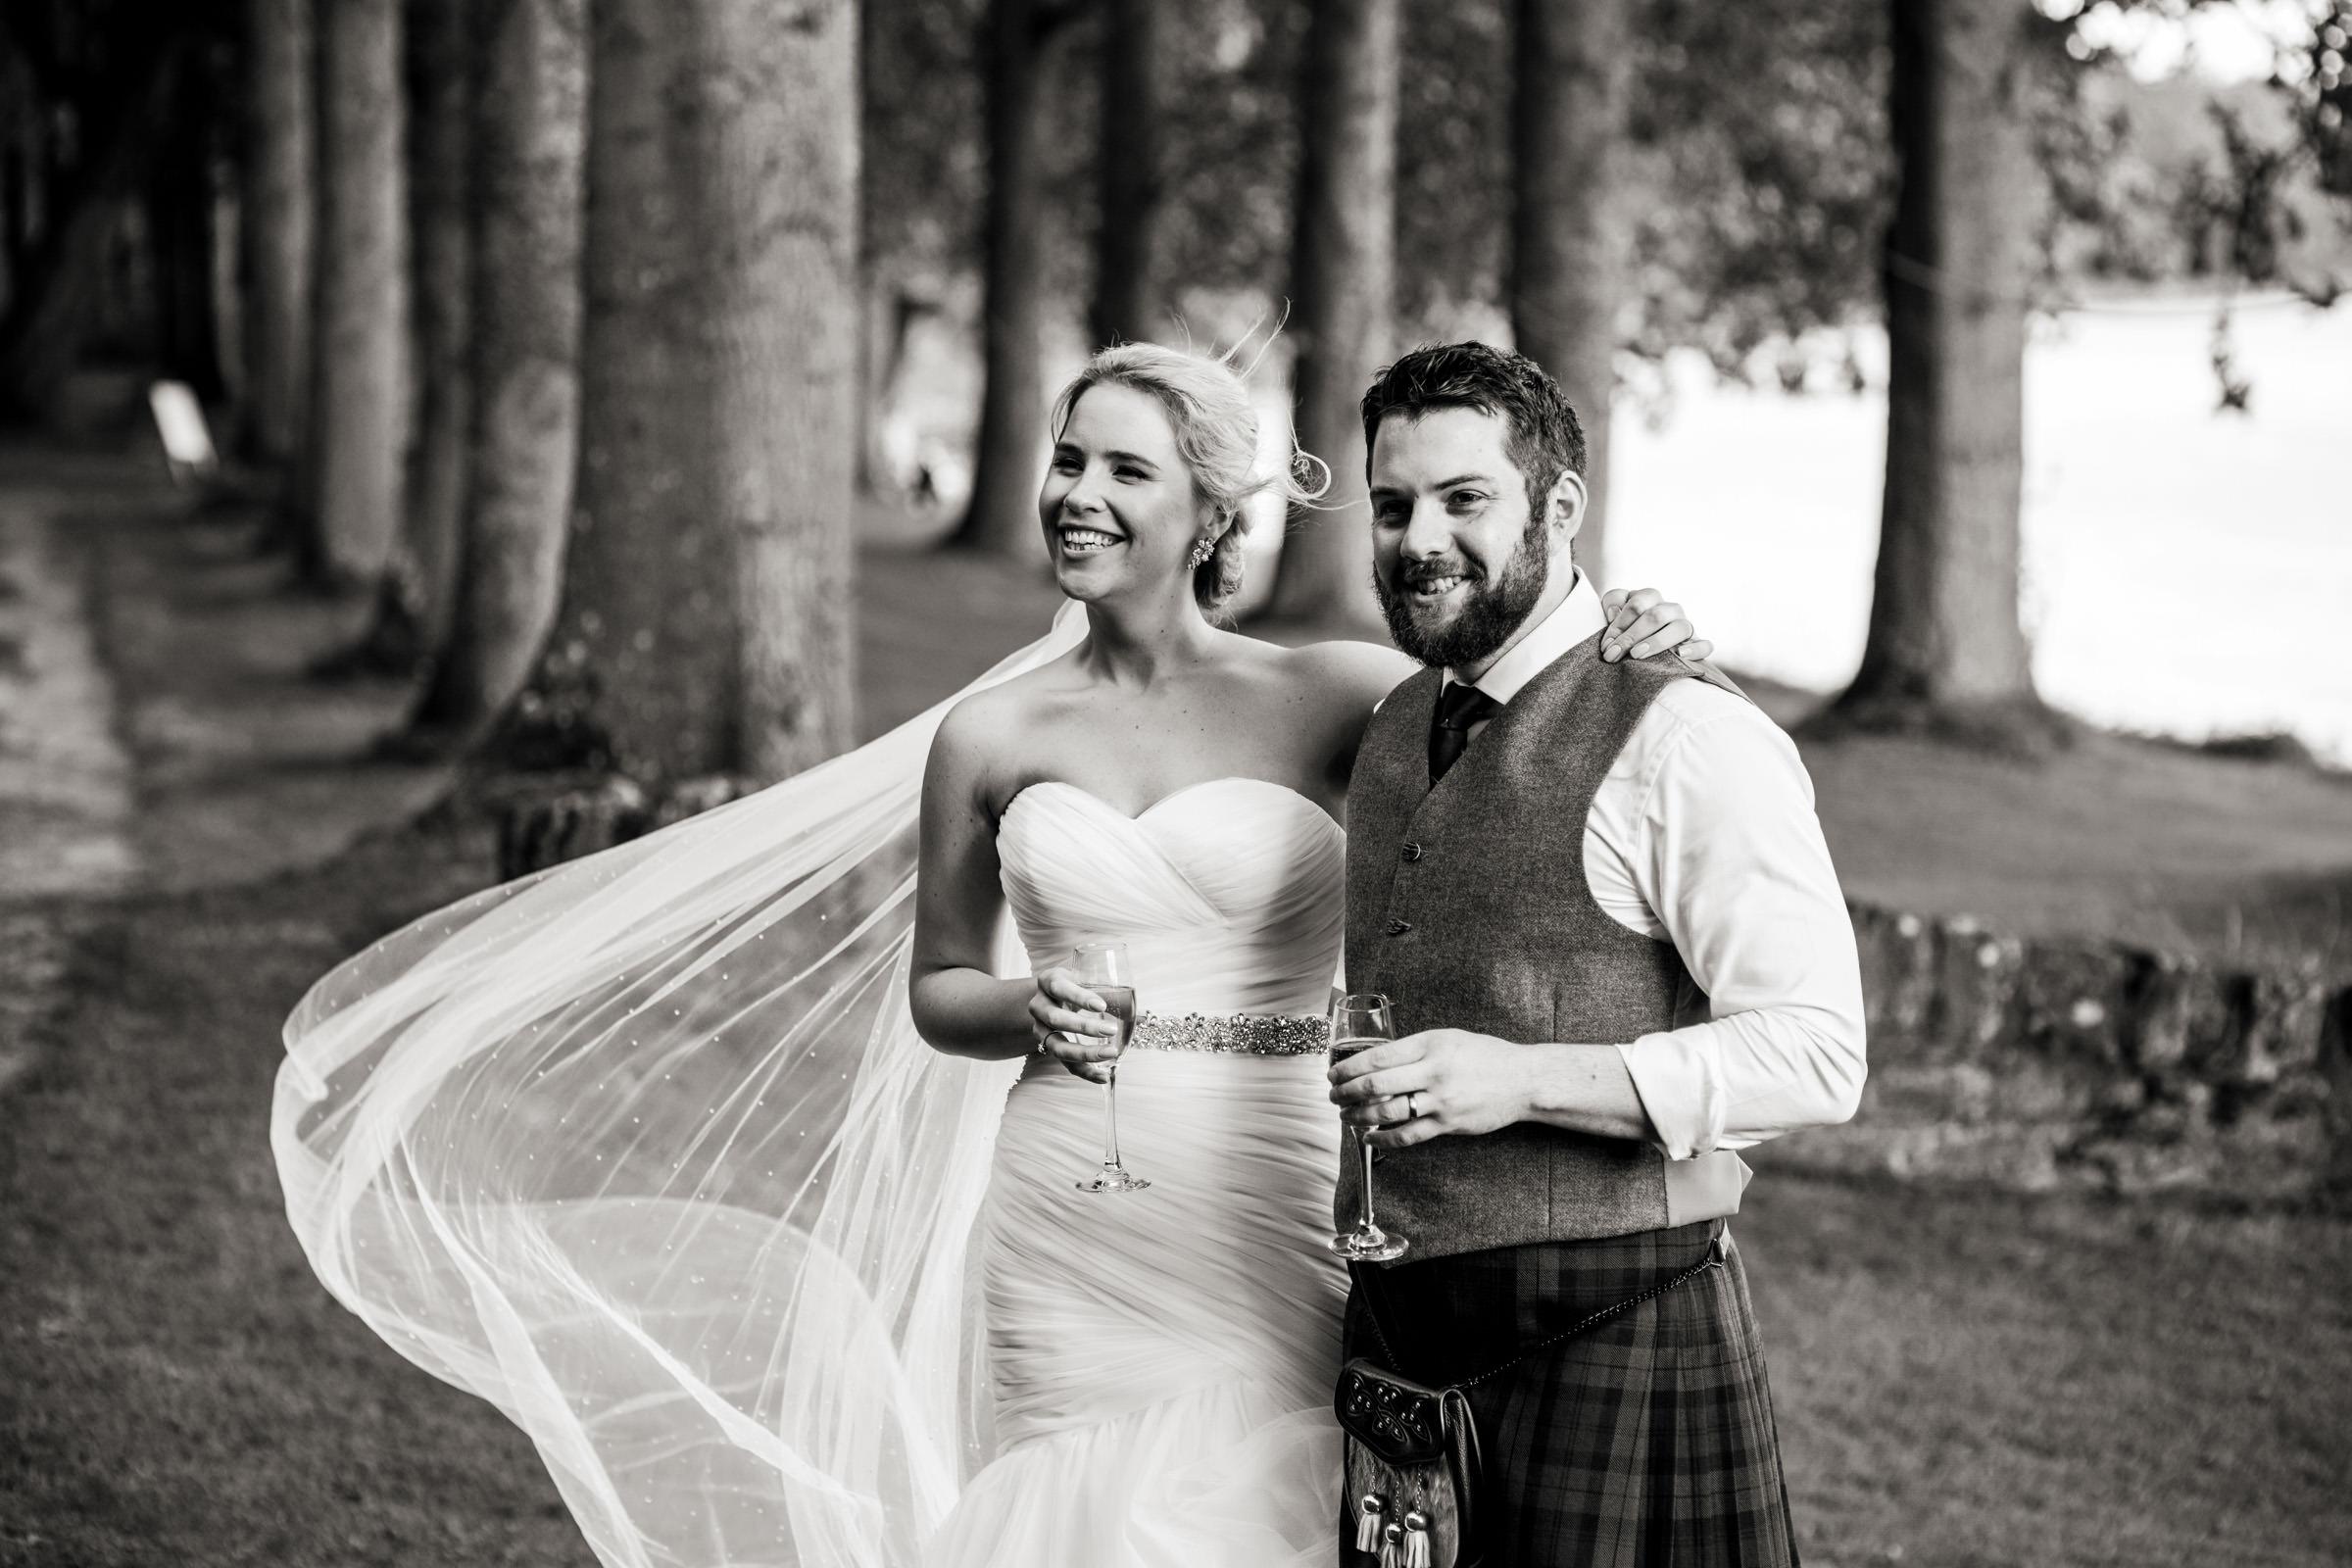 Documentart wedding photographers Berwick-upon-Tweed 011.jpg